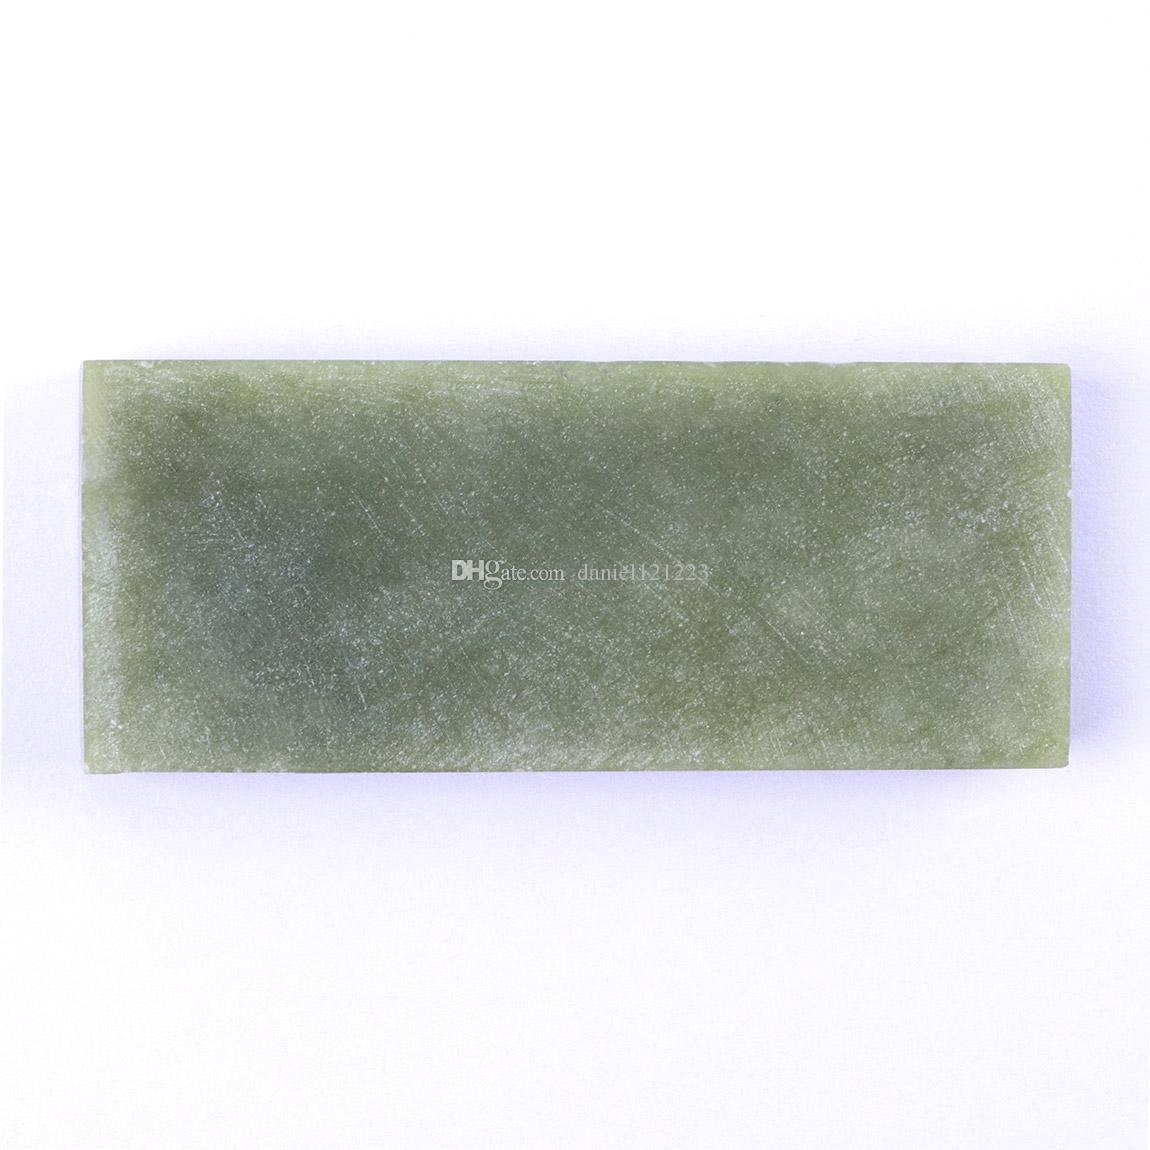 Grit 10000# Knife Razor Sharpener Fine Stone Oil Stone Whetstone Oilstone Polishing Mirror